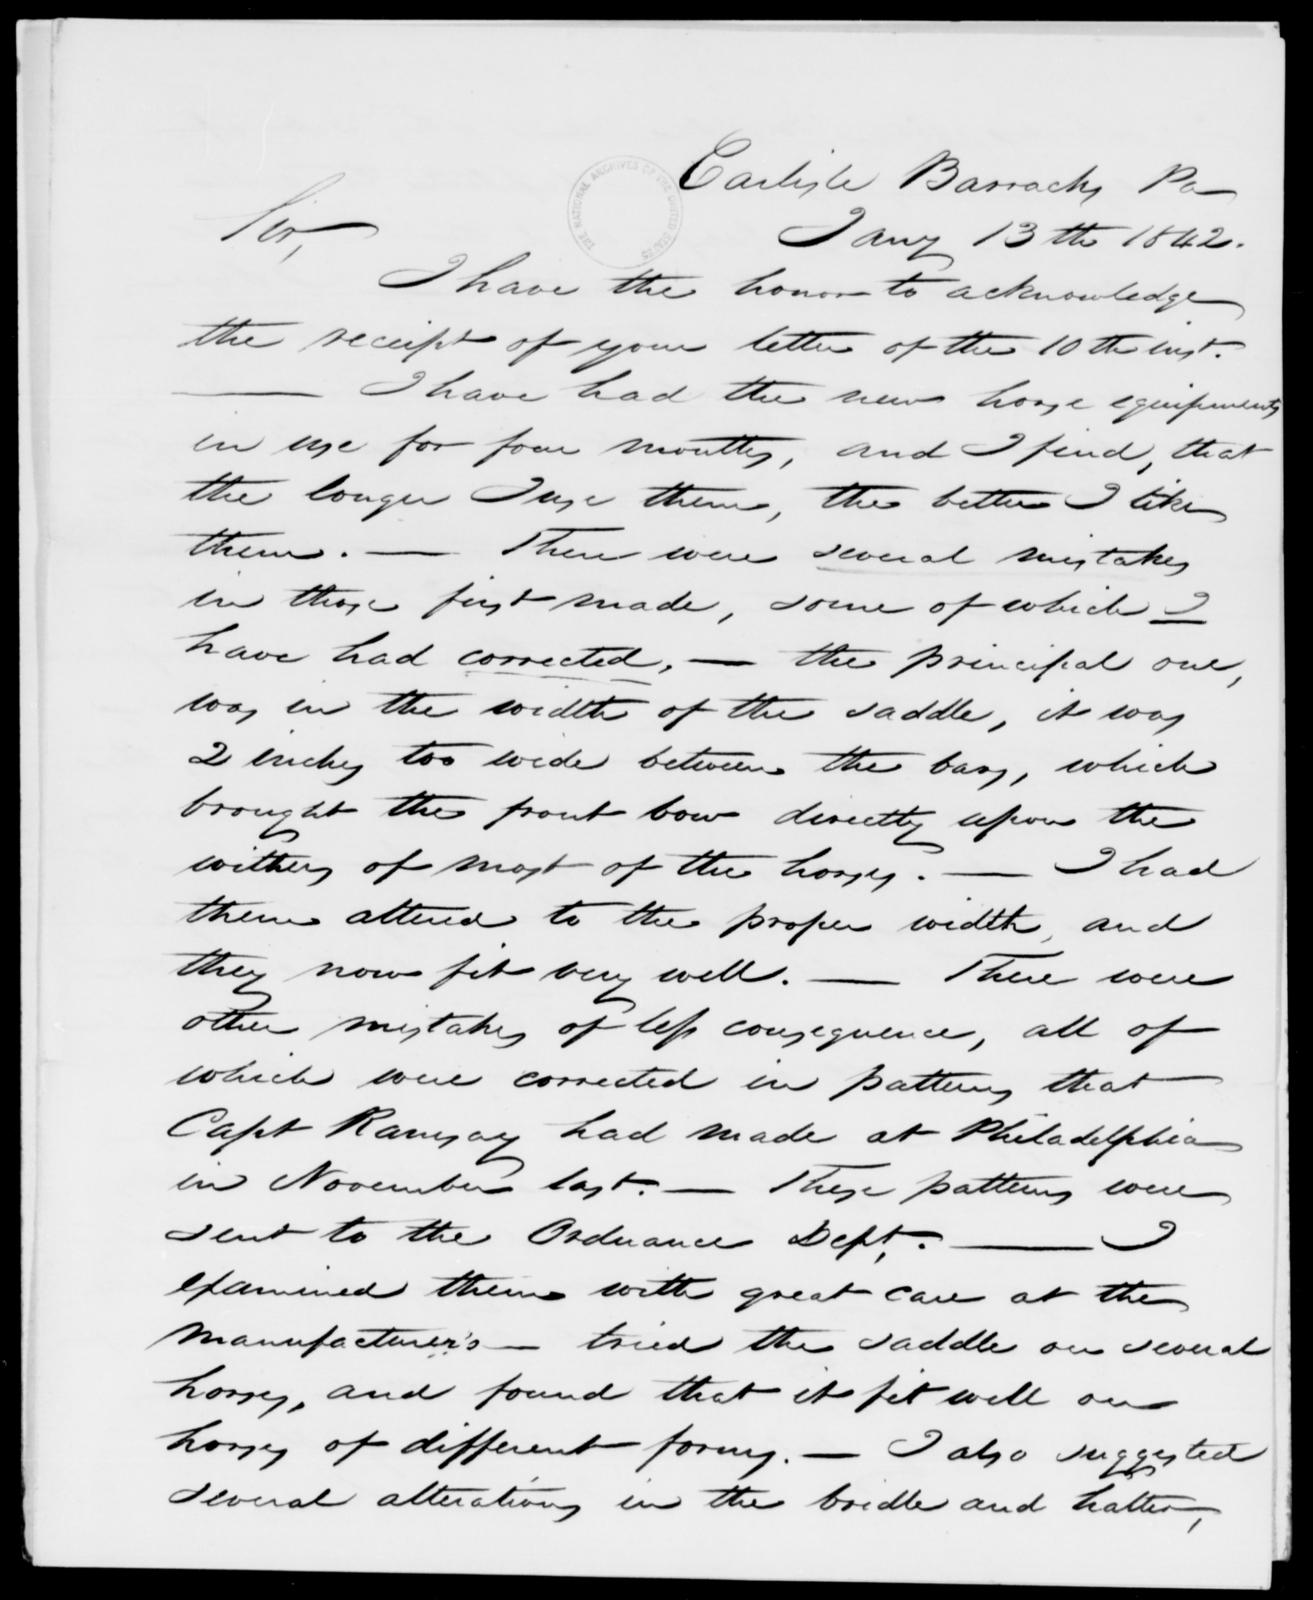 Sumner, E V - State: Pennsylvania - Year: 1842 - File Number: S10